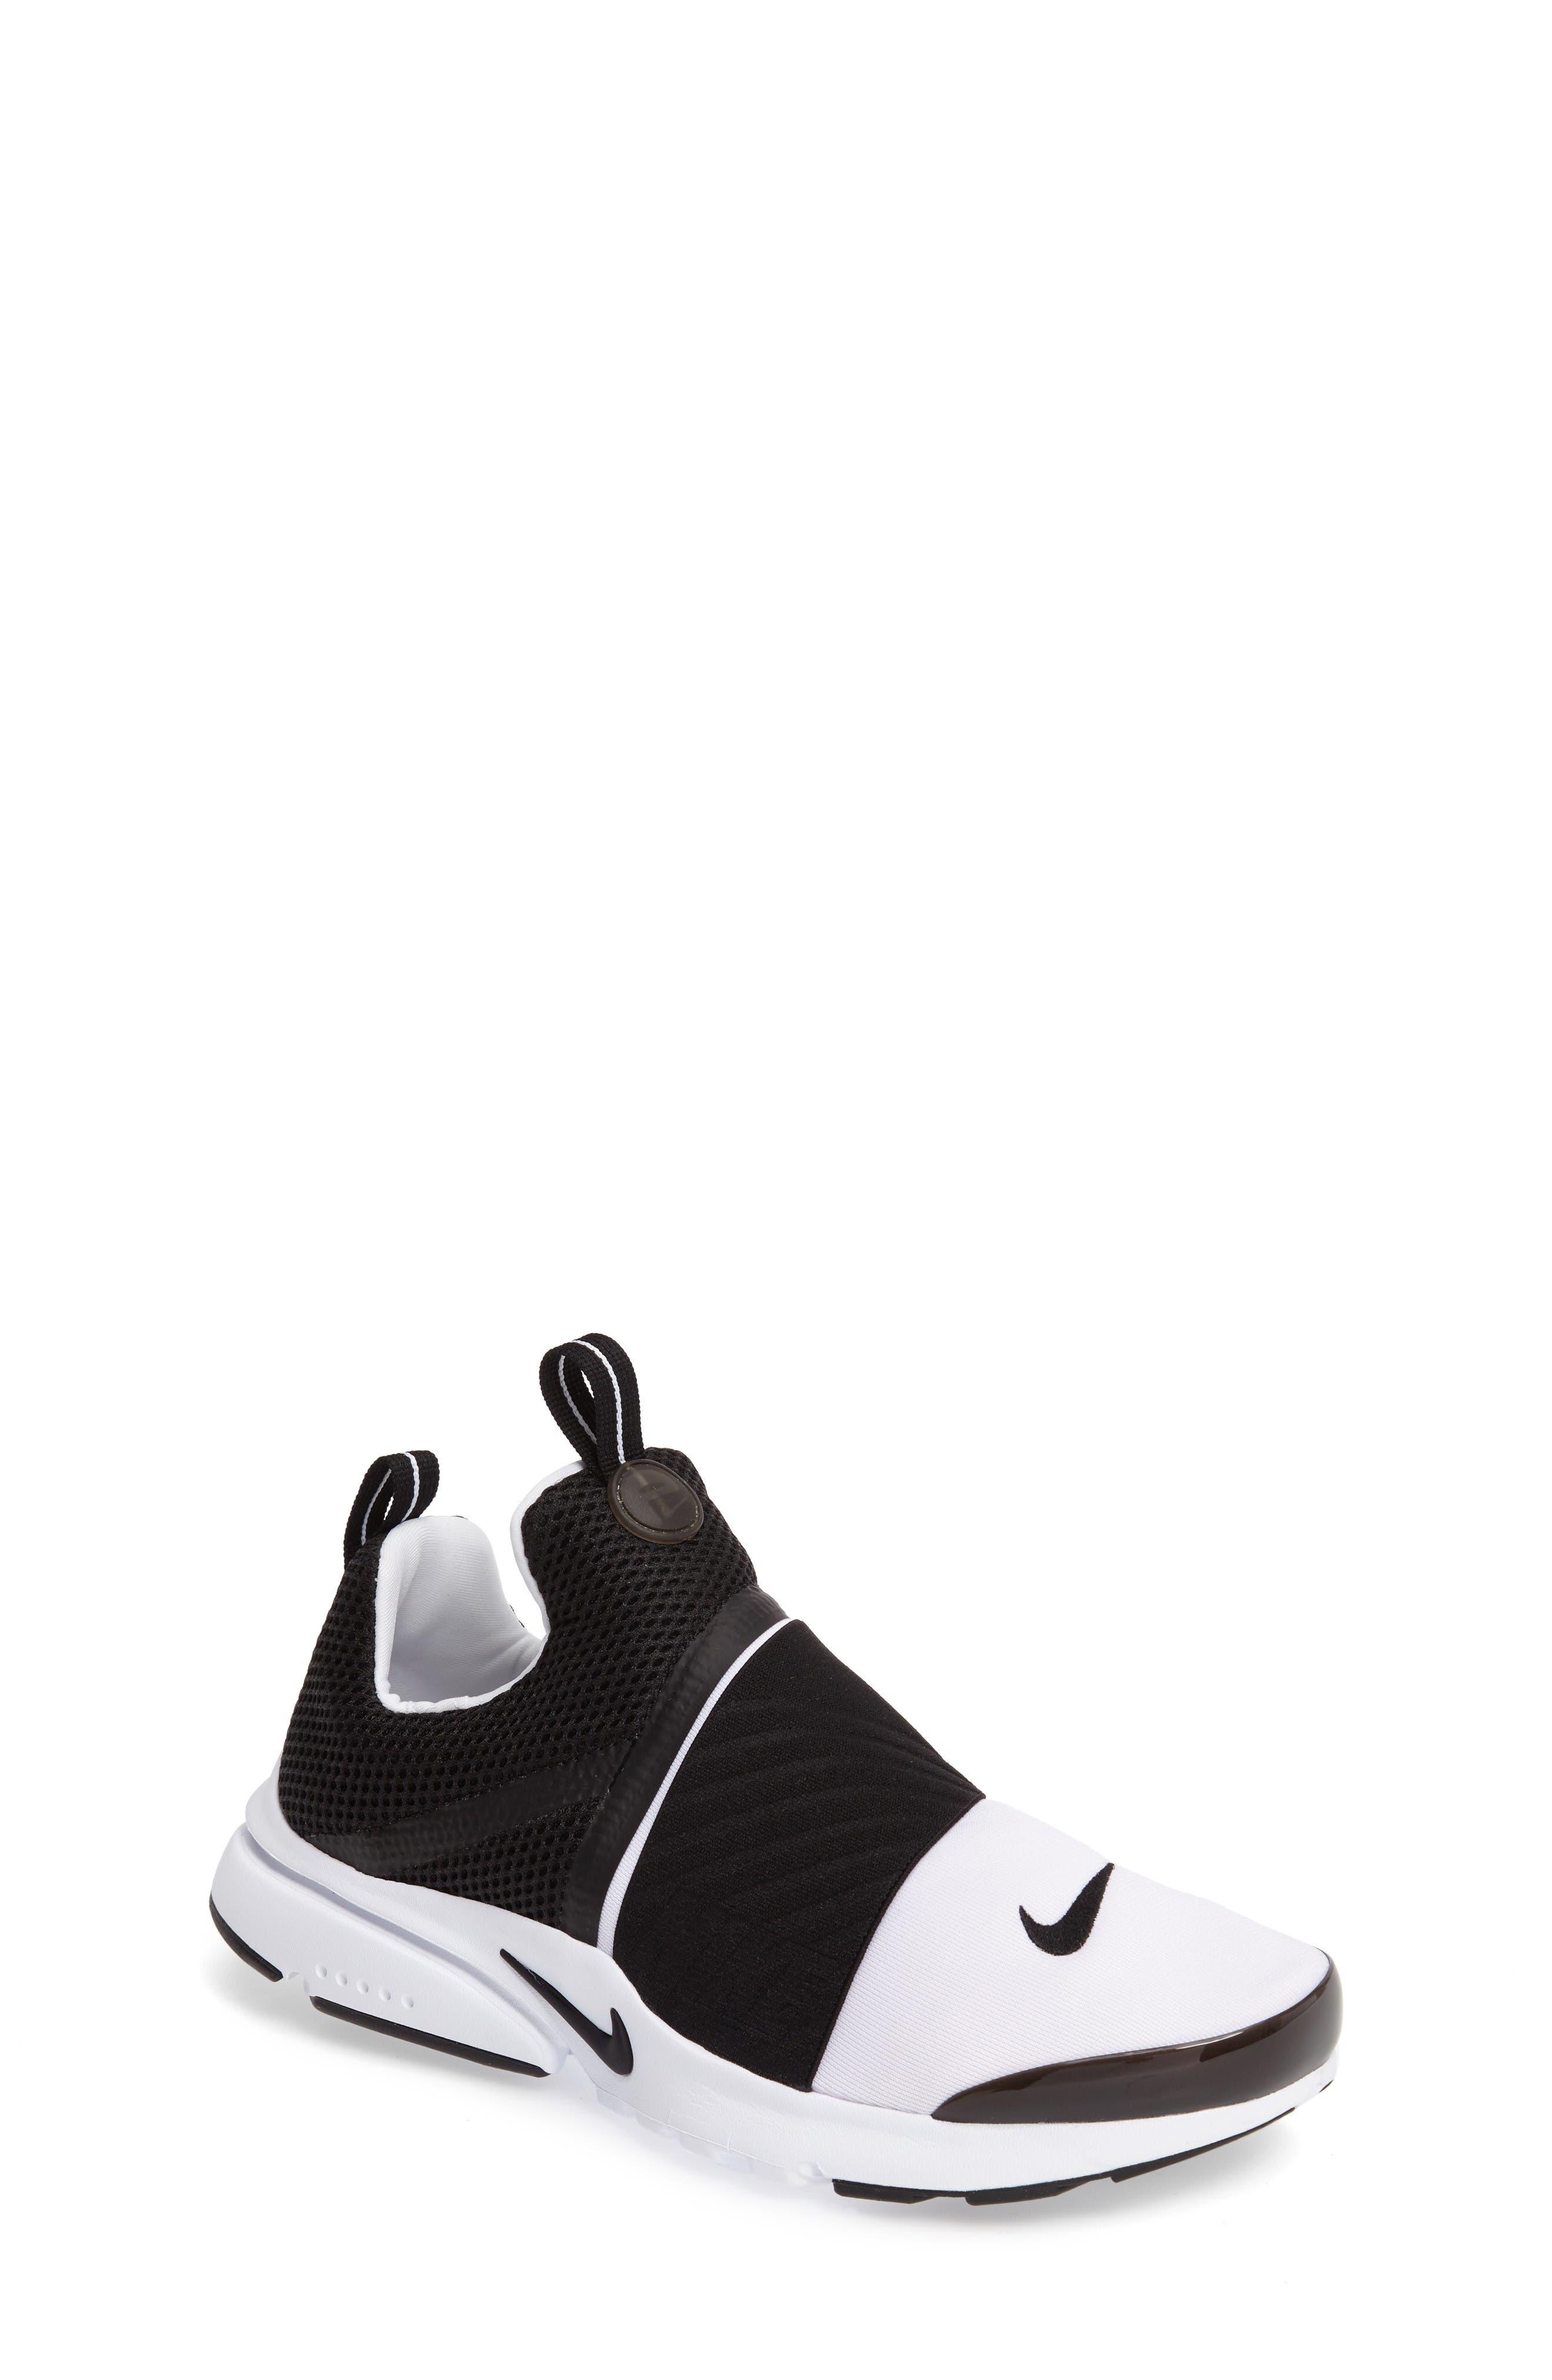 Alternate Image 1 Selected - Nike Presto Extreme Sneaker (Walker, Toddler, Little Kid & Big Kid)